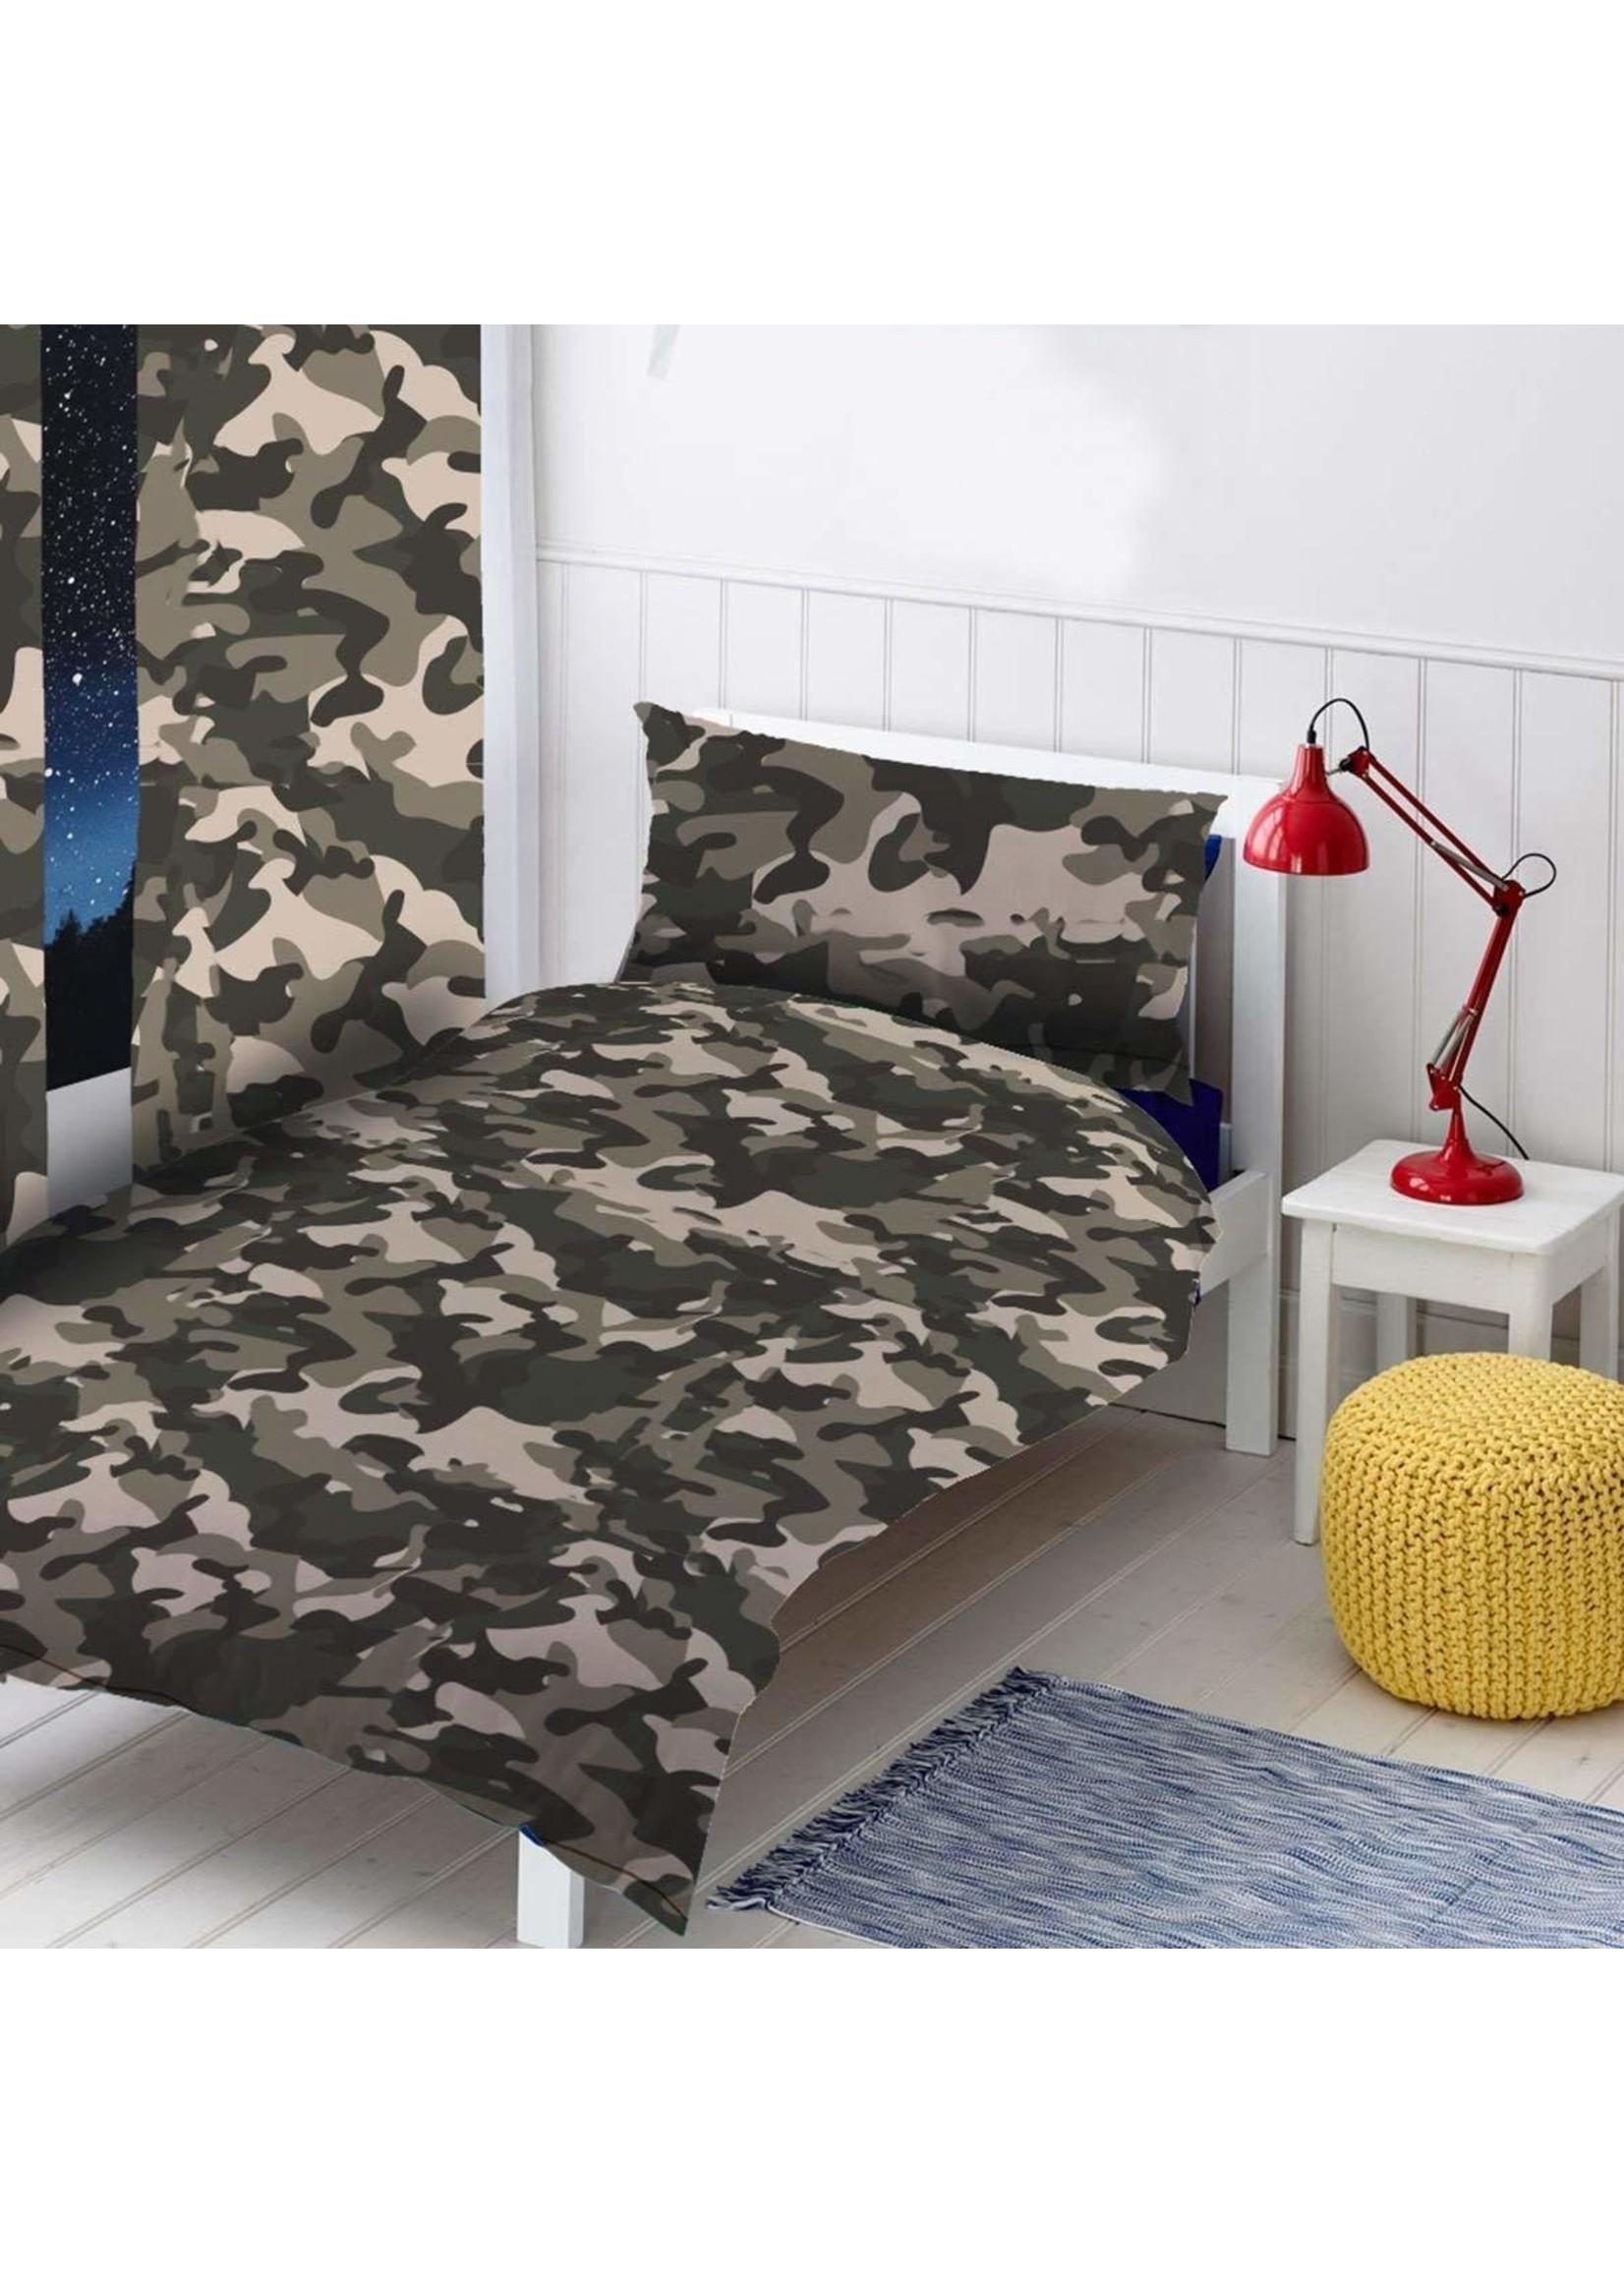 Topstyle Camouflage Gordijn